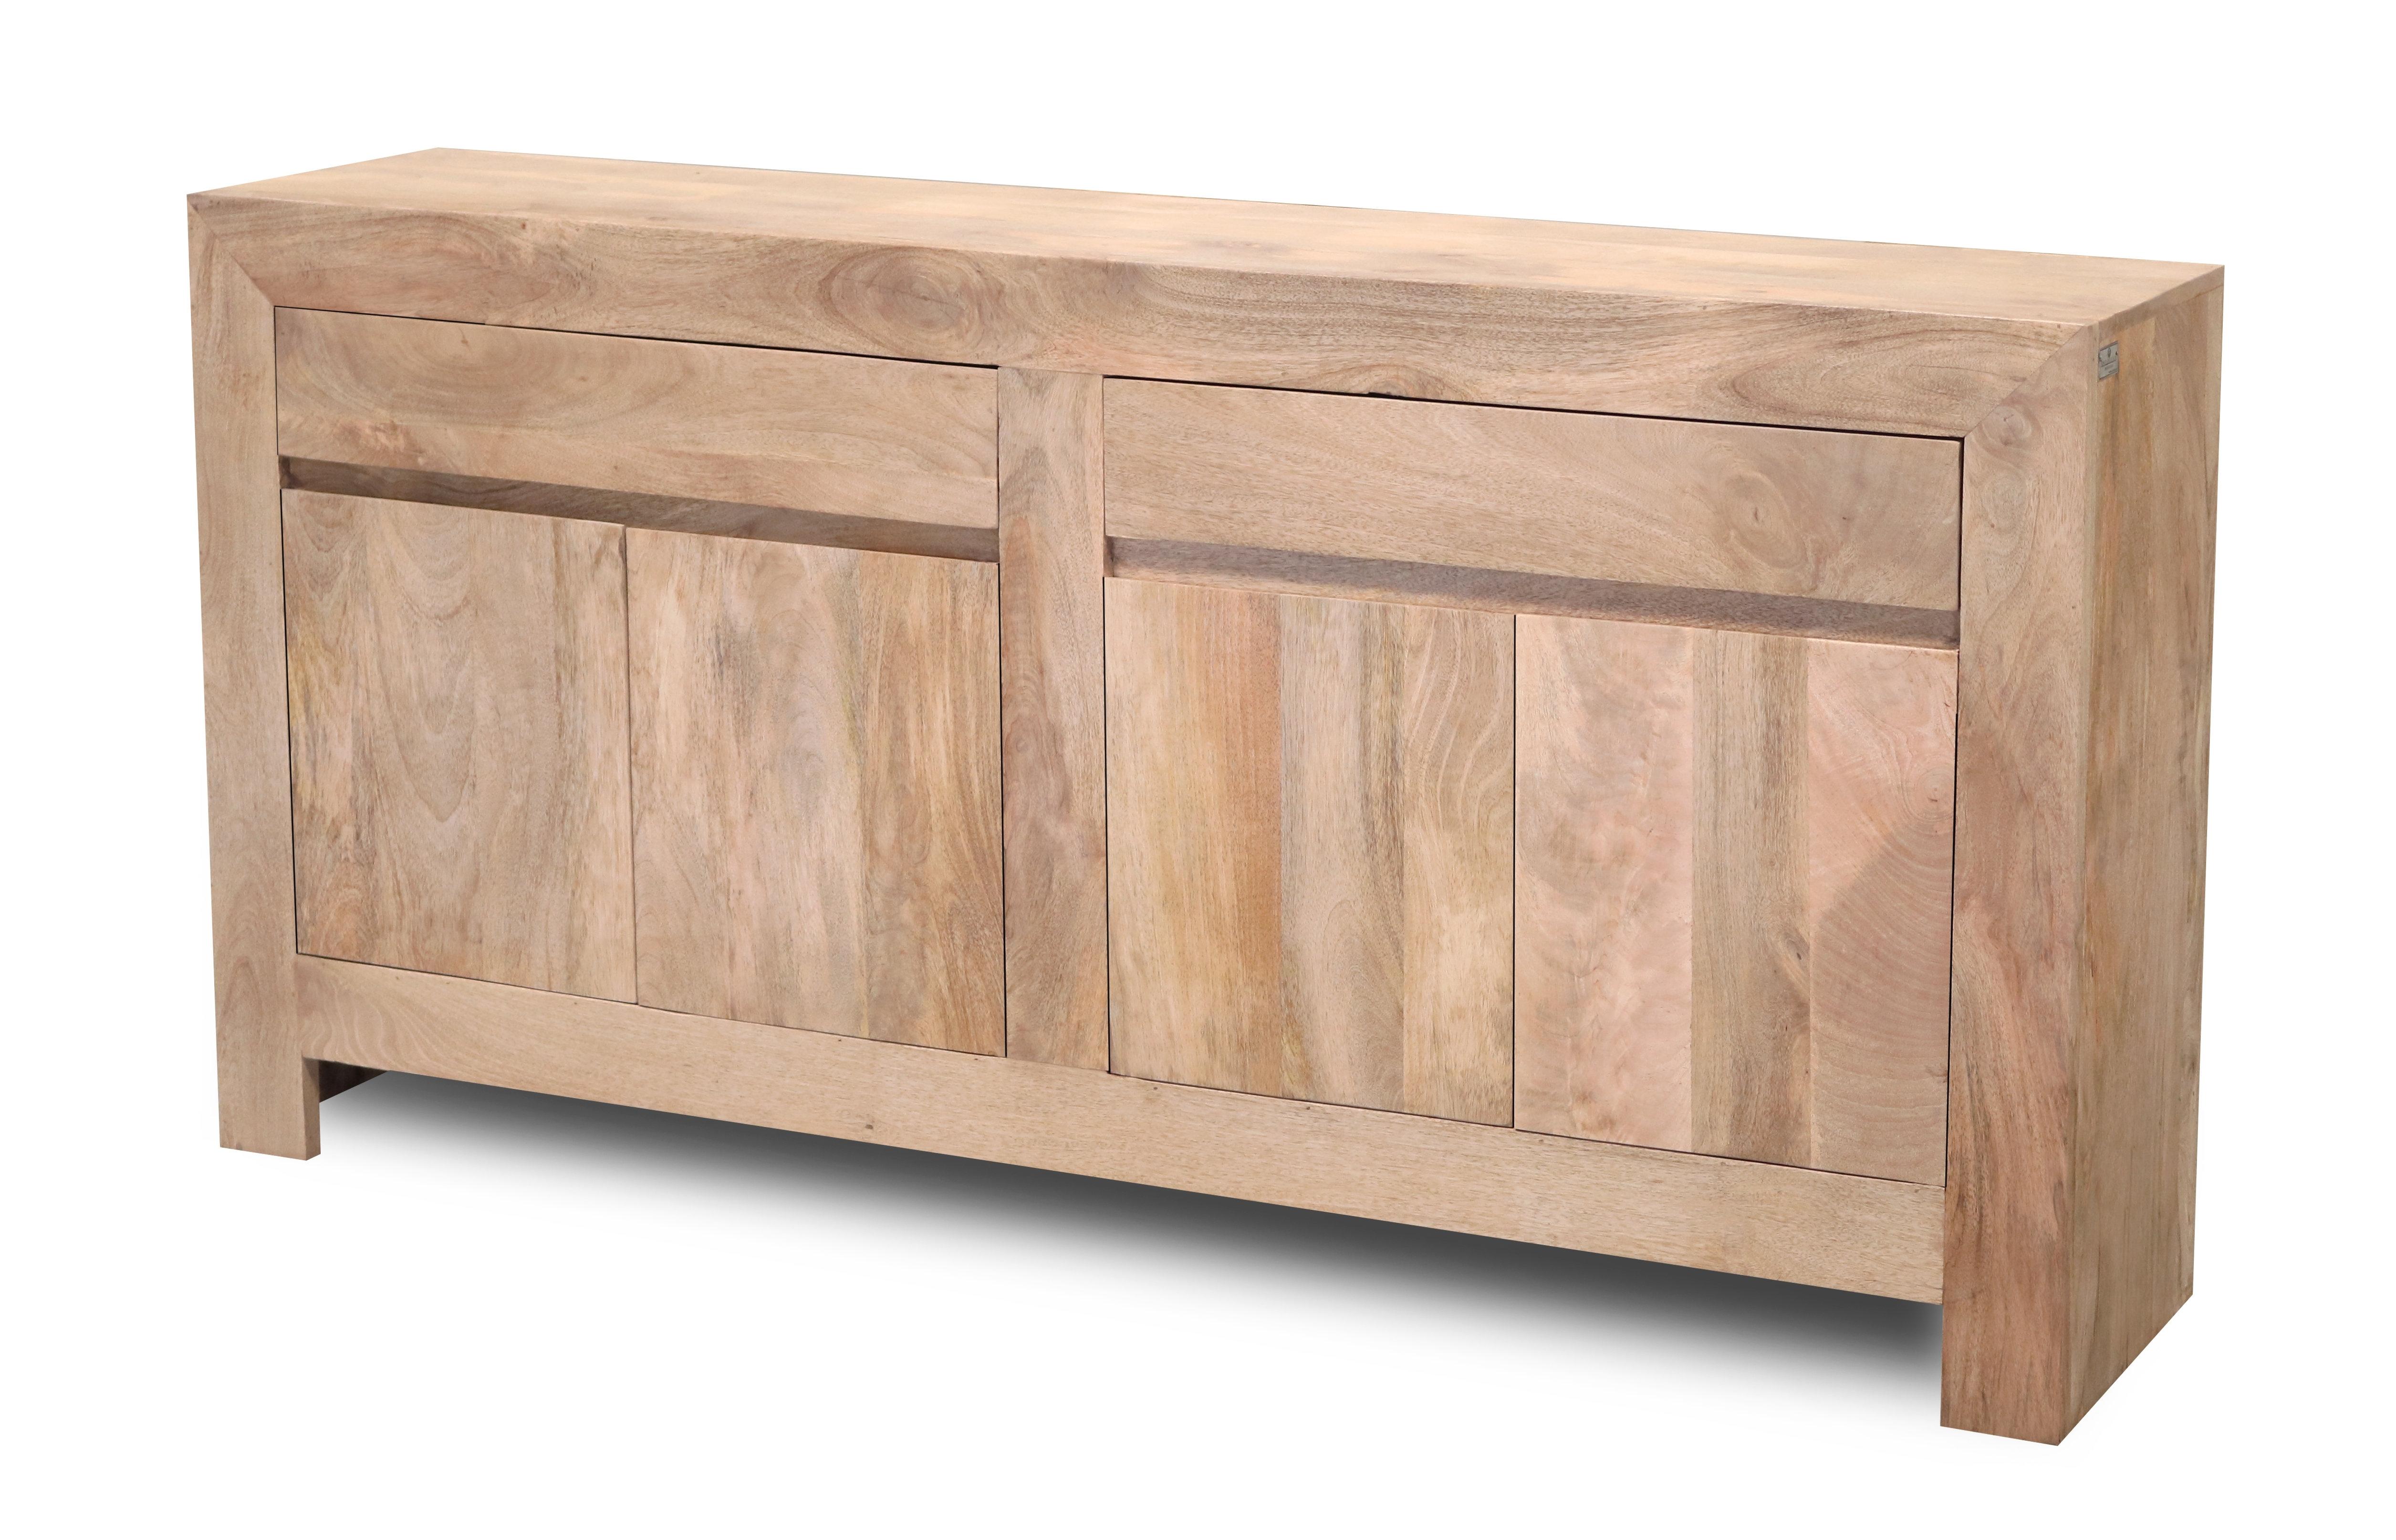 Unodesign Verona 4 Door 2 Drawer Sideboard | Wayfair.co.uk pertaining to Mango Wood 2-Door/2-Drawer Sideboards (Image 29 of 30)